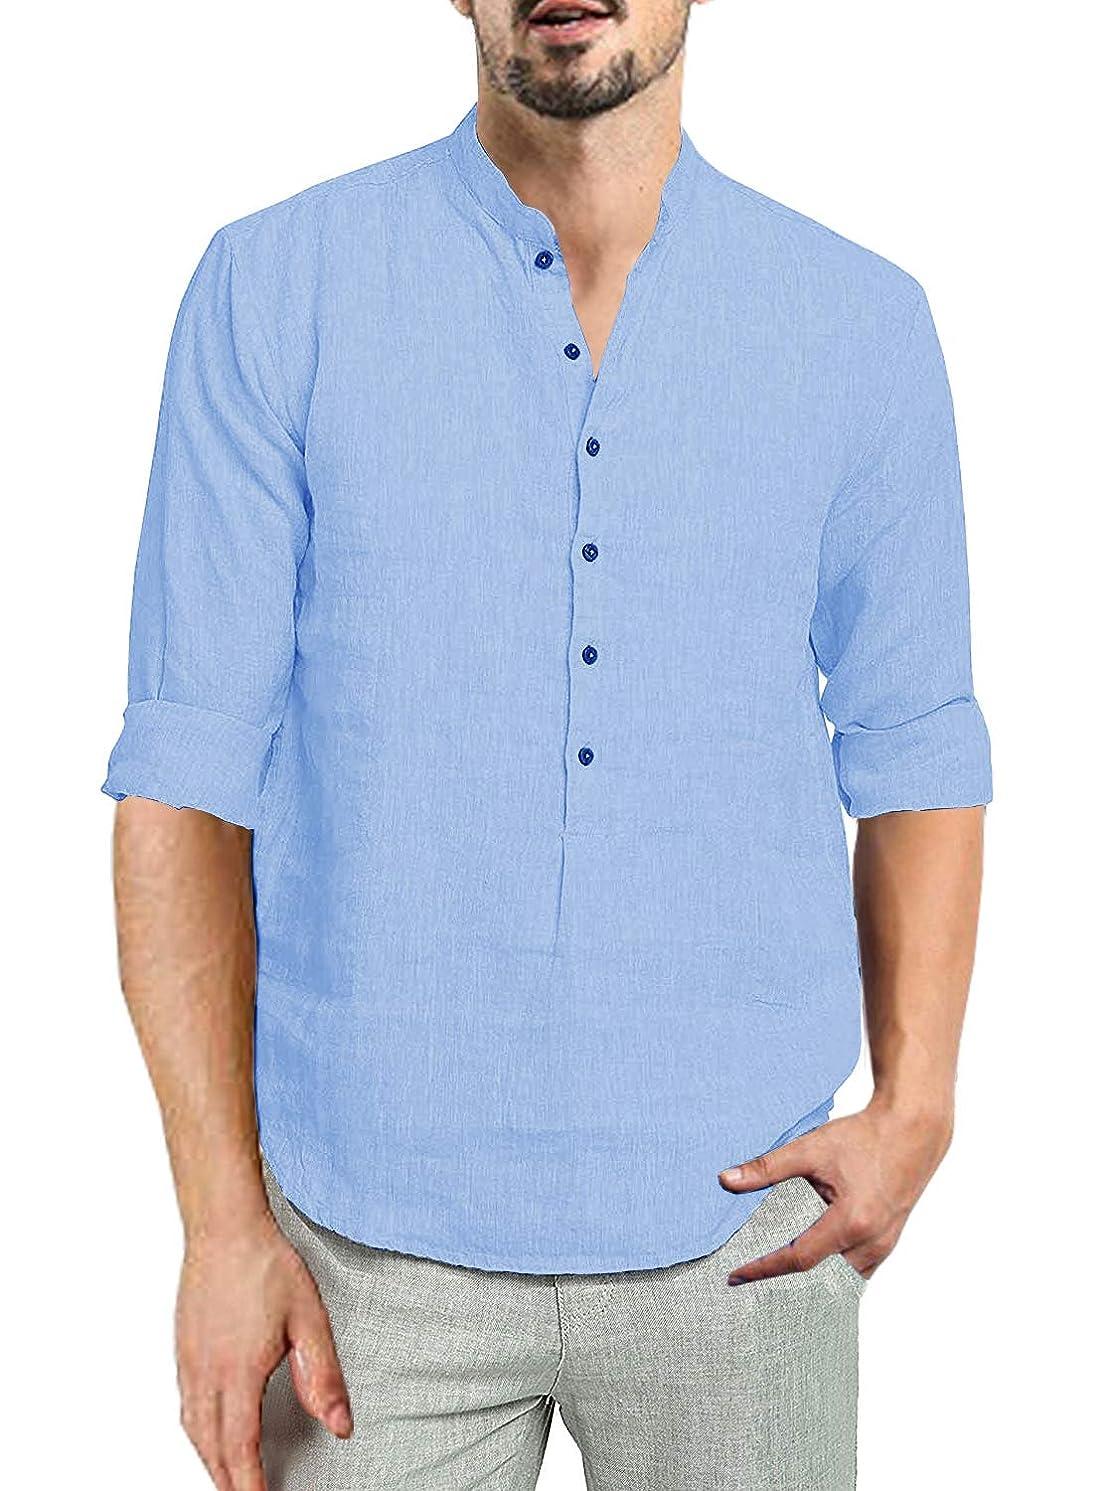 Beotyshow Mens 3/4 Sleeve Cotton Linen Button Front Placket Pullover Shirts Plain Hippie Henley Shirts for Men